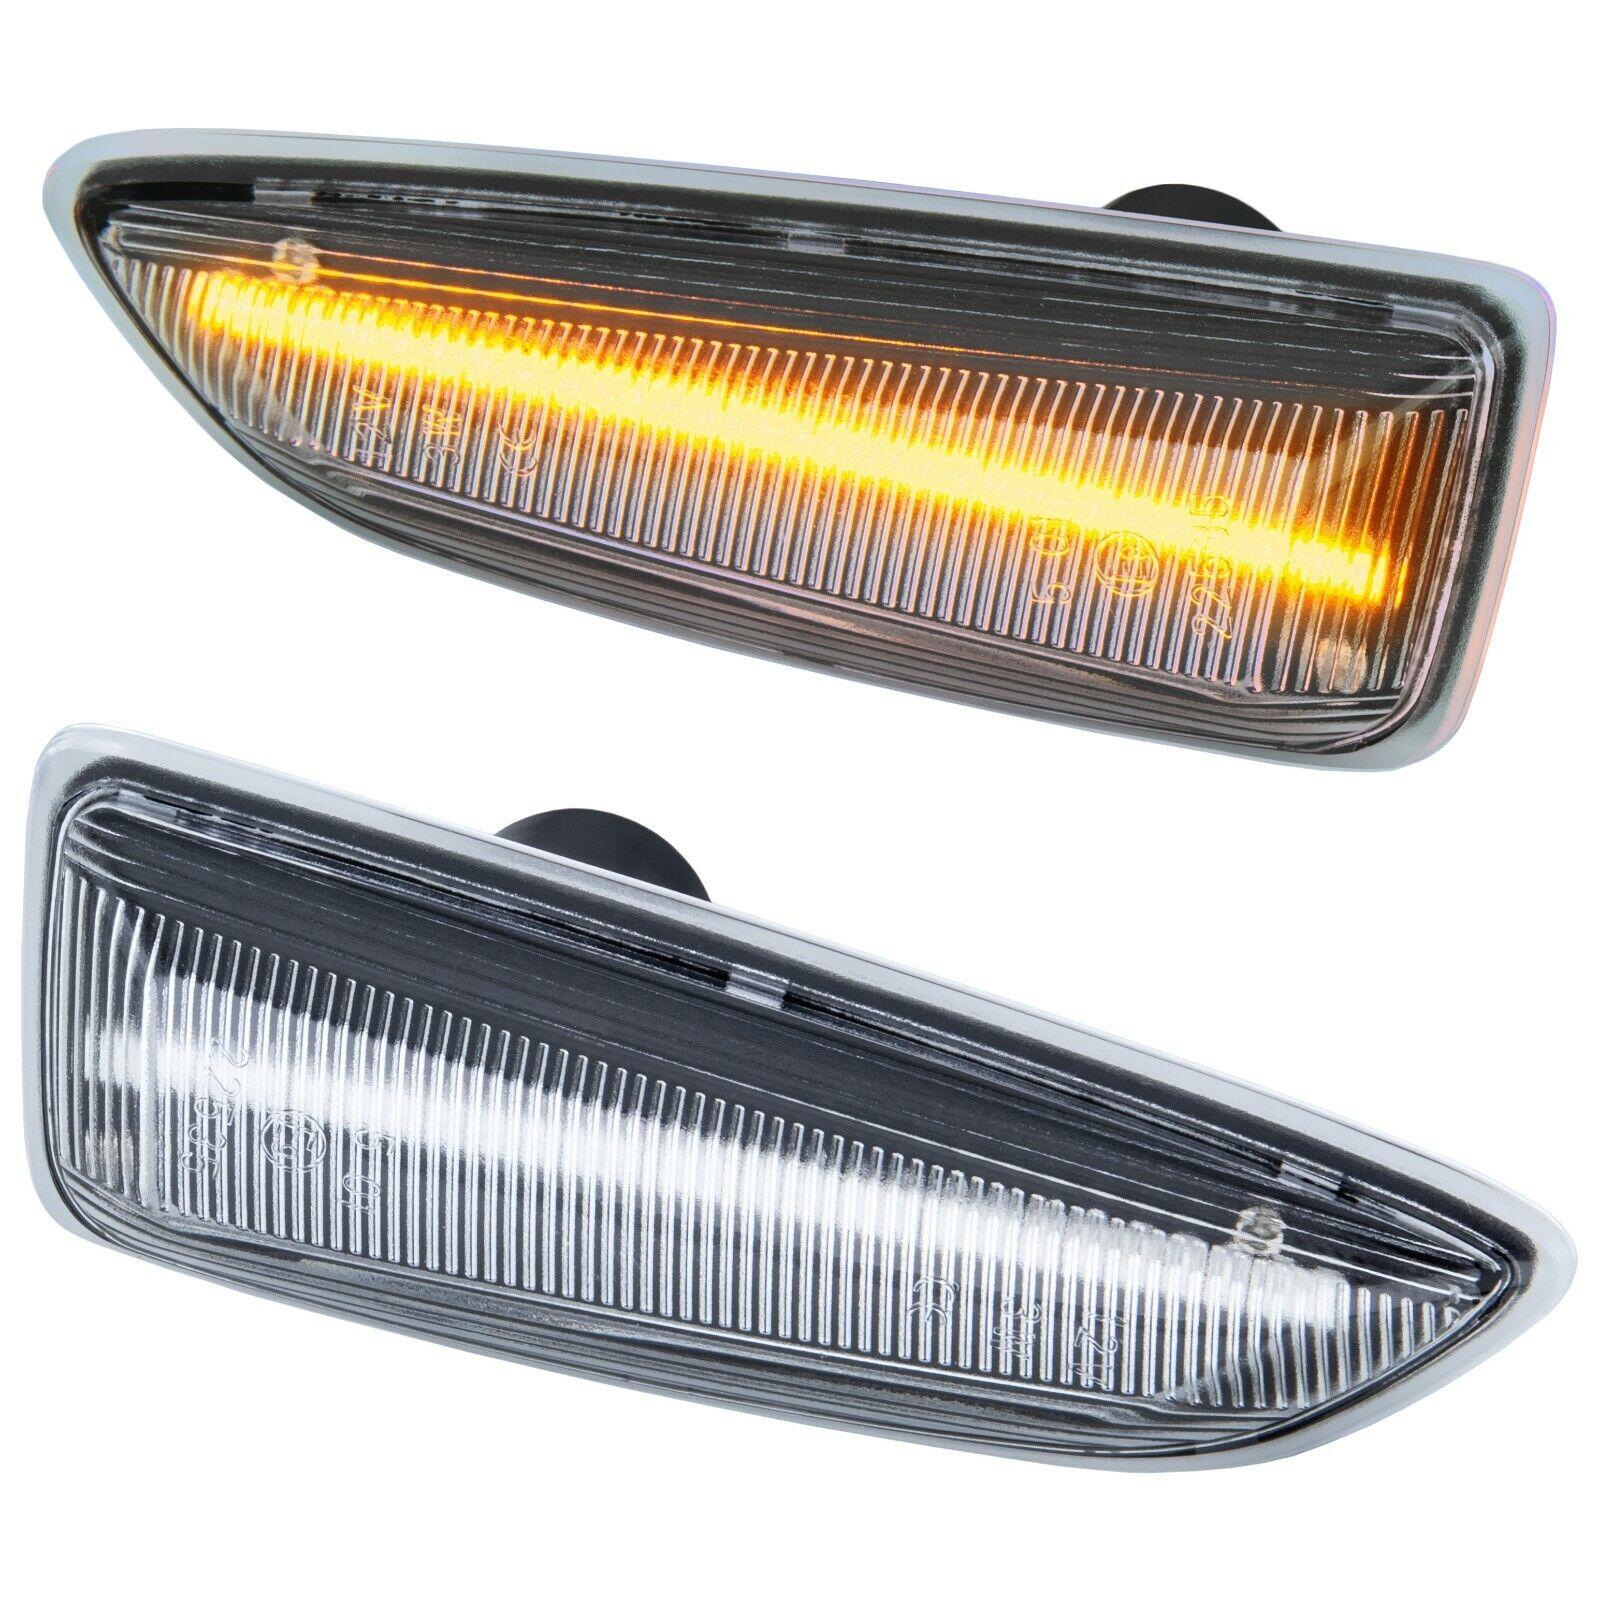 121 TOP Schwarz LED Seitenblinker Blinker Für Opel Insignia B CC Z18